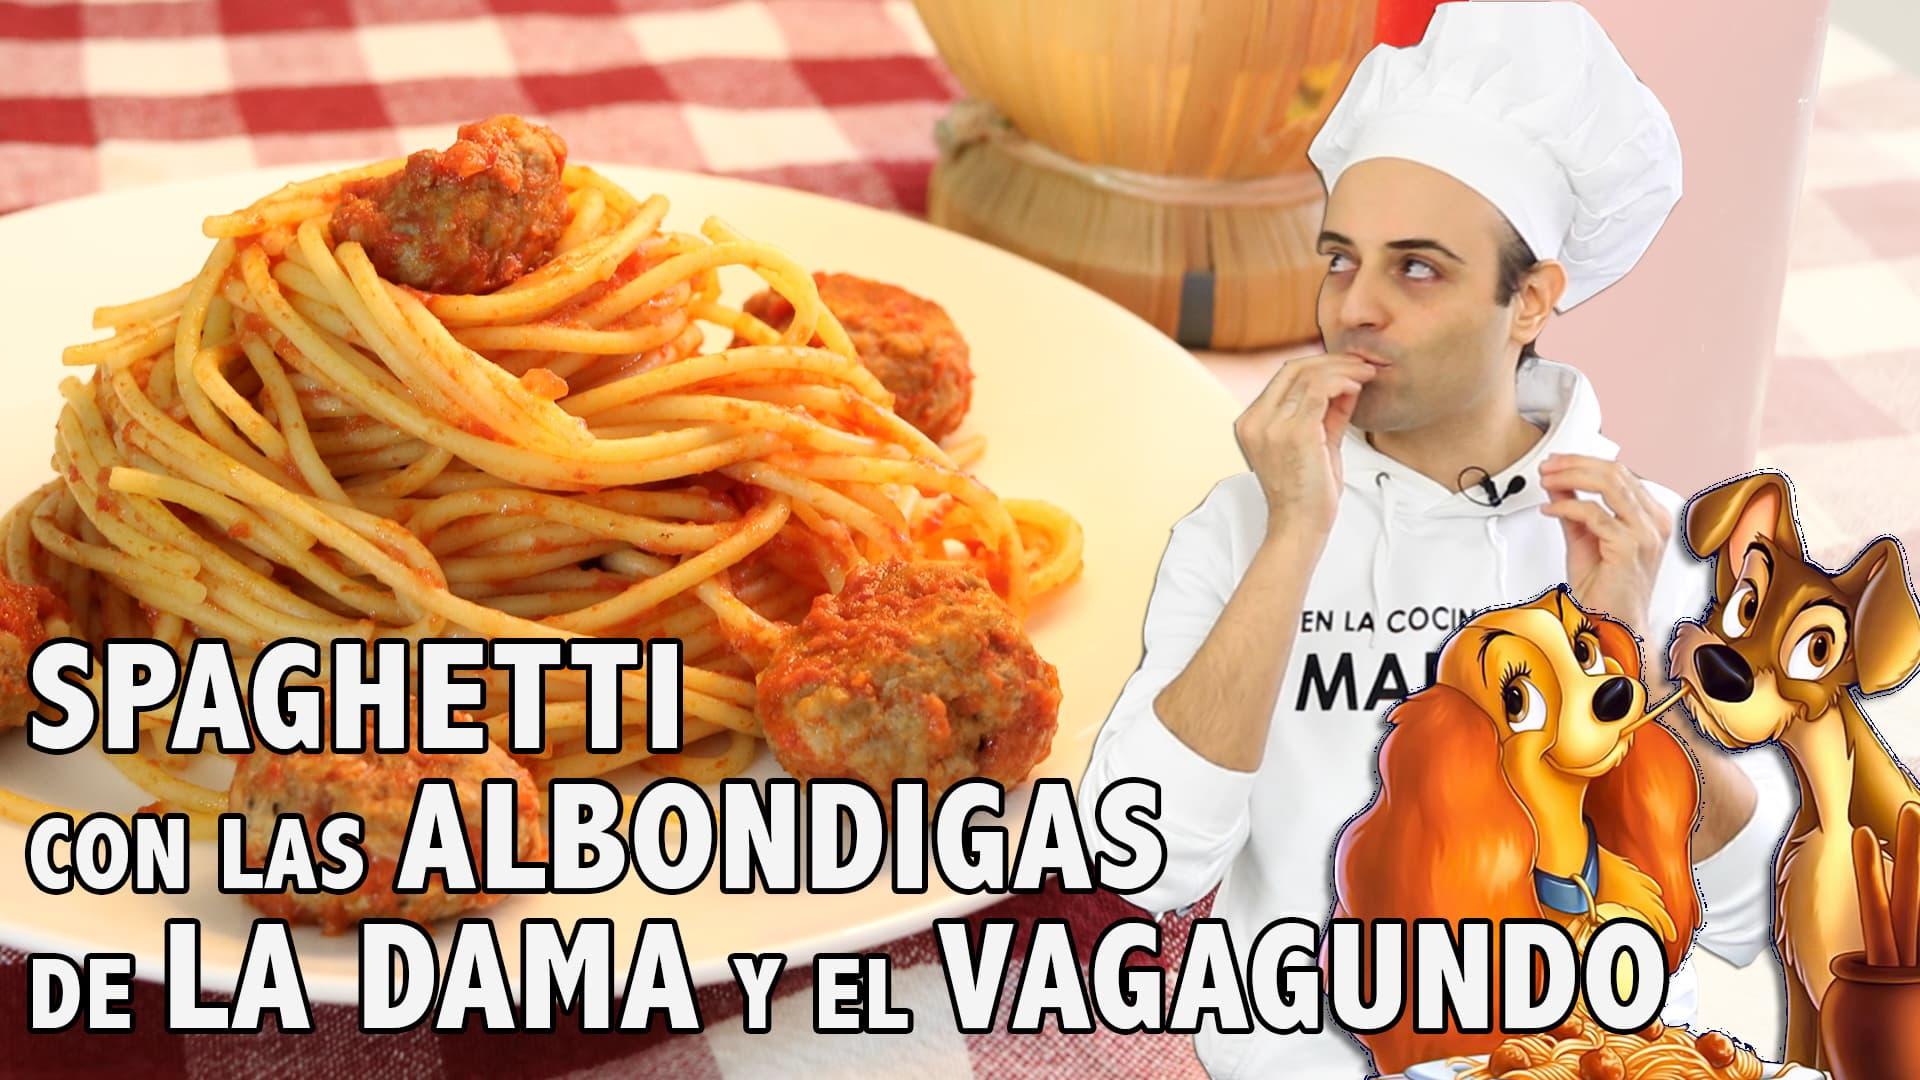 spaghetti con albondigas